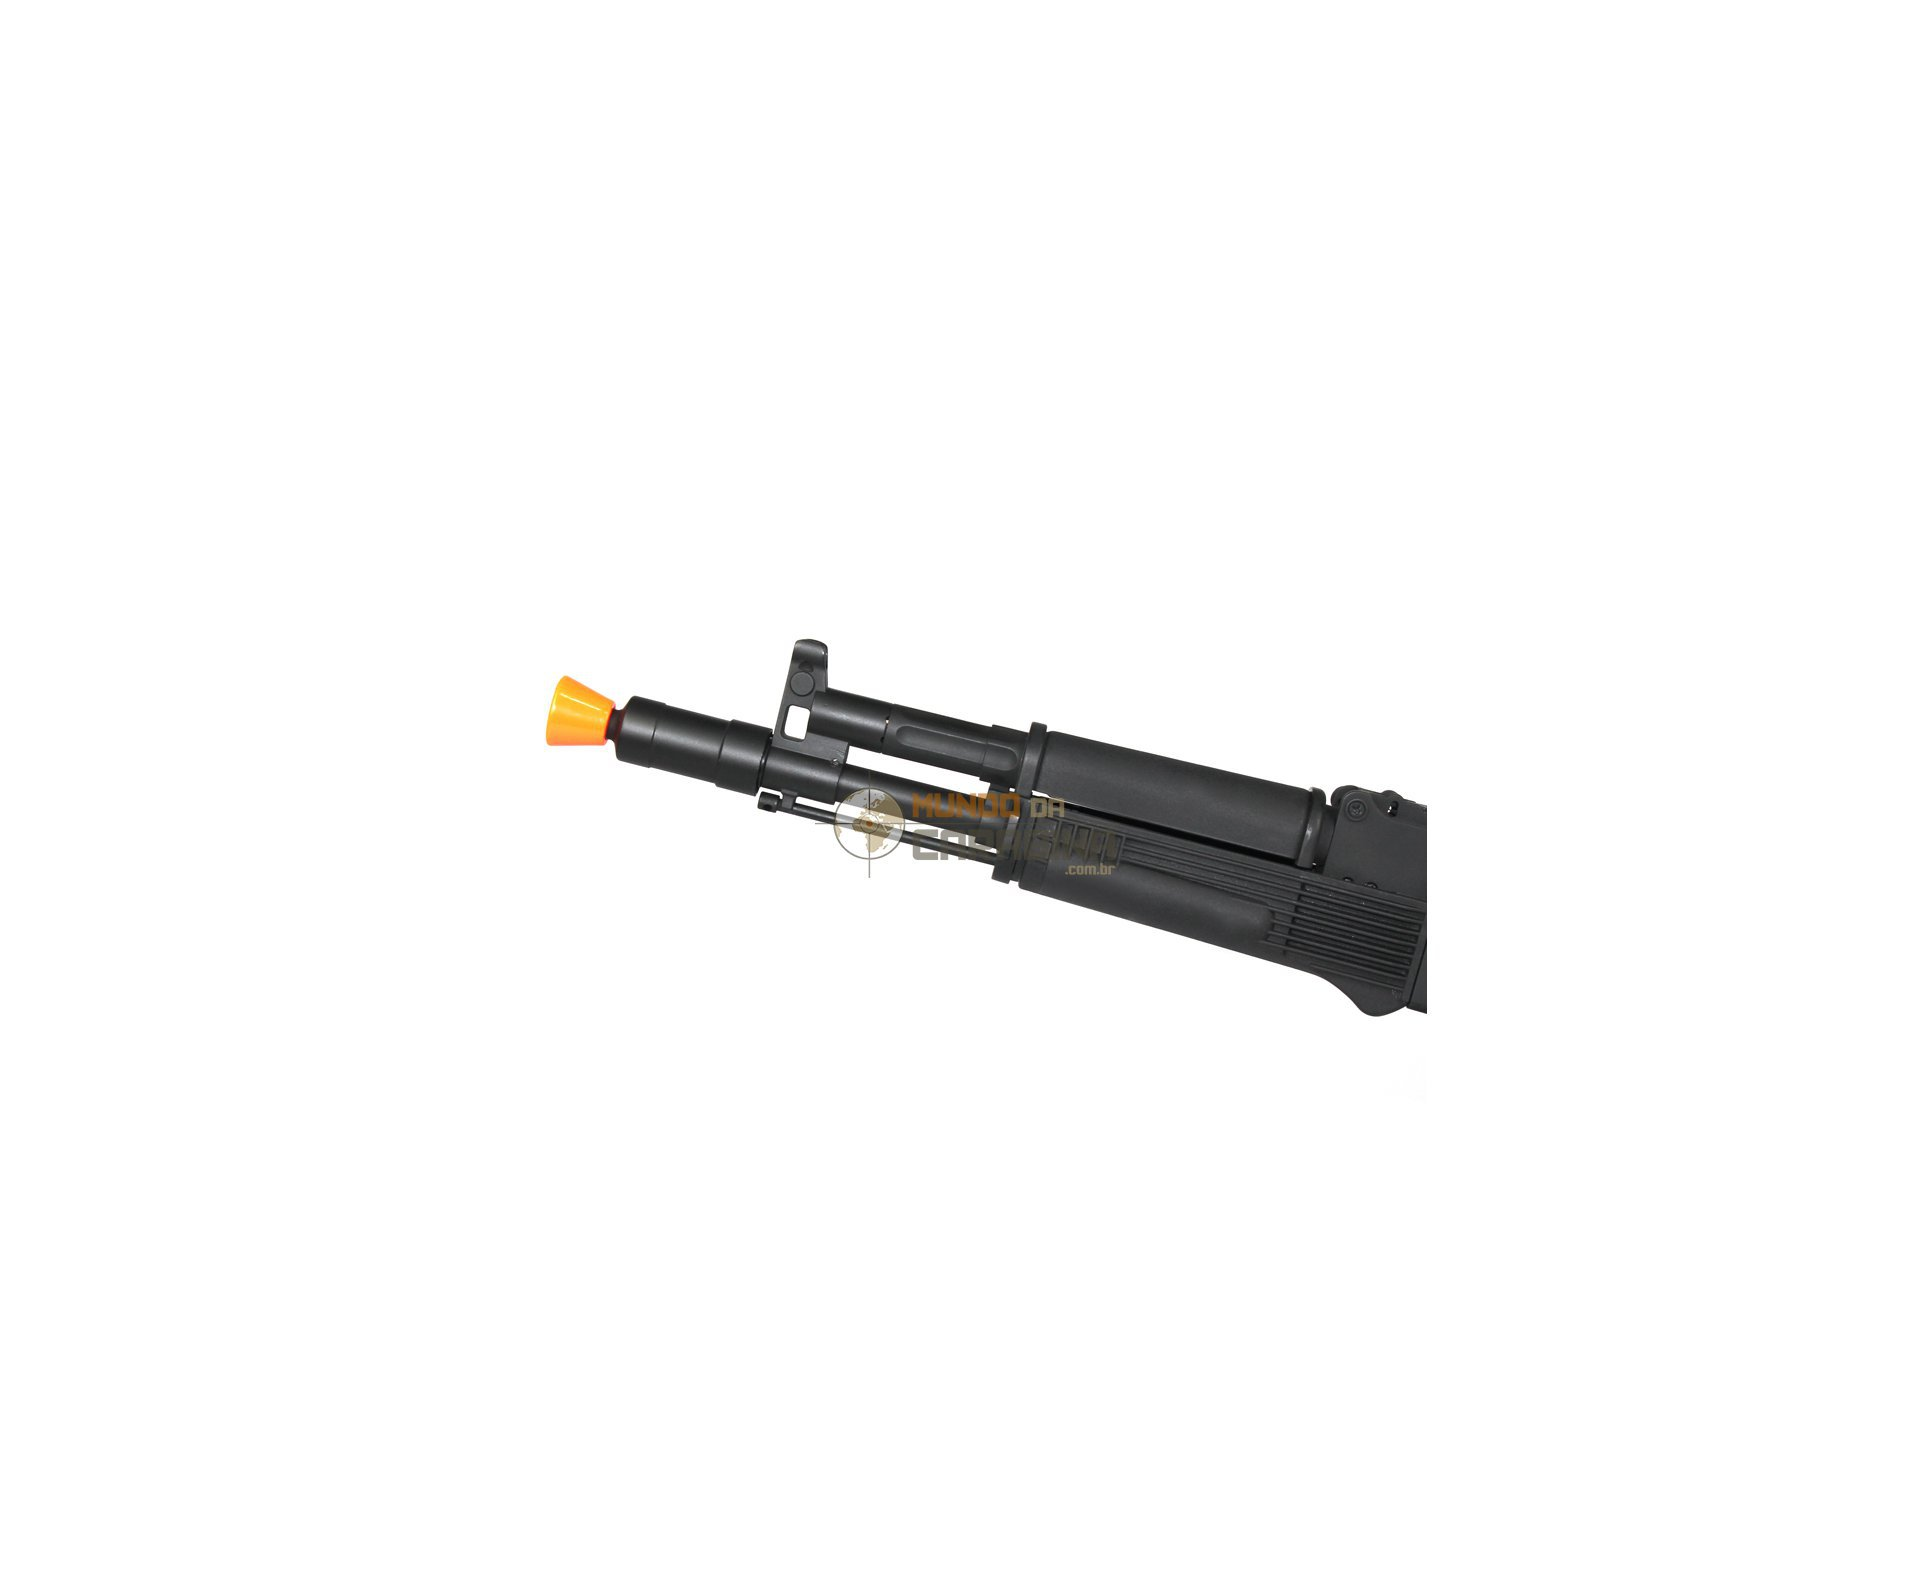 Rifle De Airsoft Ak105 Tactical Full Metal Aeg - Cal 6mm - Cyma